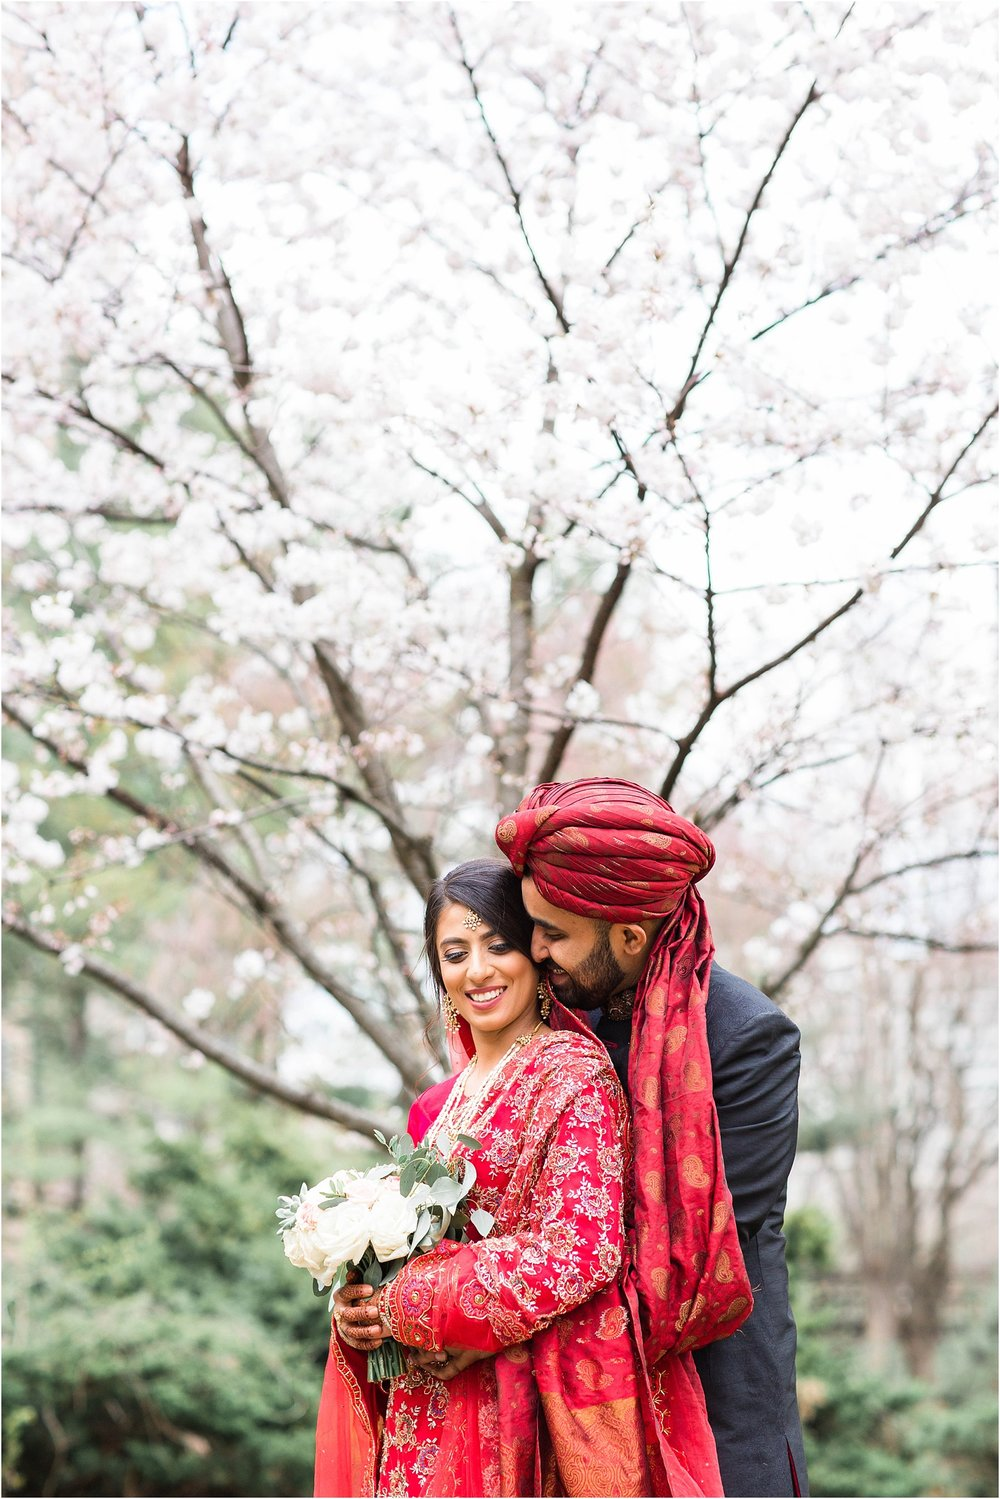 Jame-Masjid-Coopers-Mosque-Kariya-Park-Cherry-Blossoms-Wedding-Toronto-Mississauga-Brampton-Scarborough-GTA-Pakistani-Indian-Wedding-Engagement-Photographer-Photography_0079.jpg